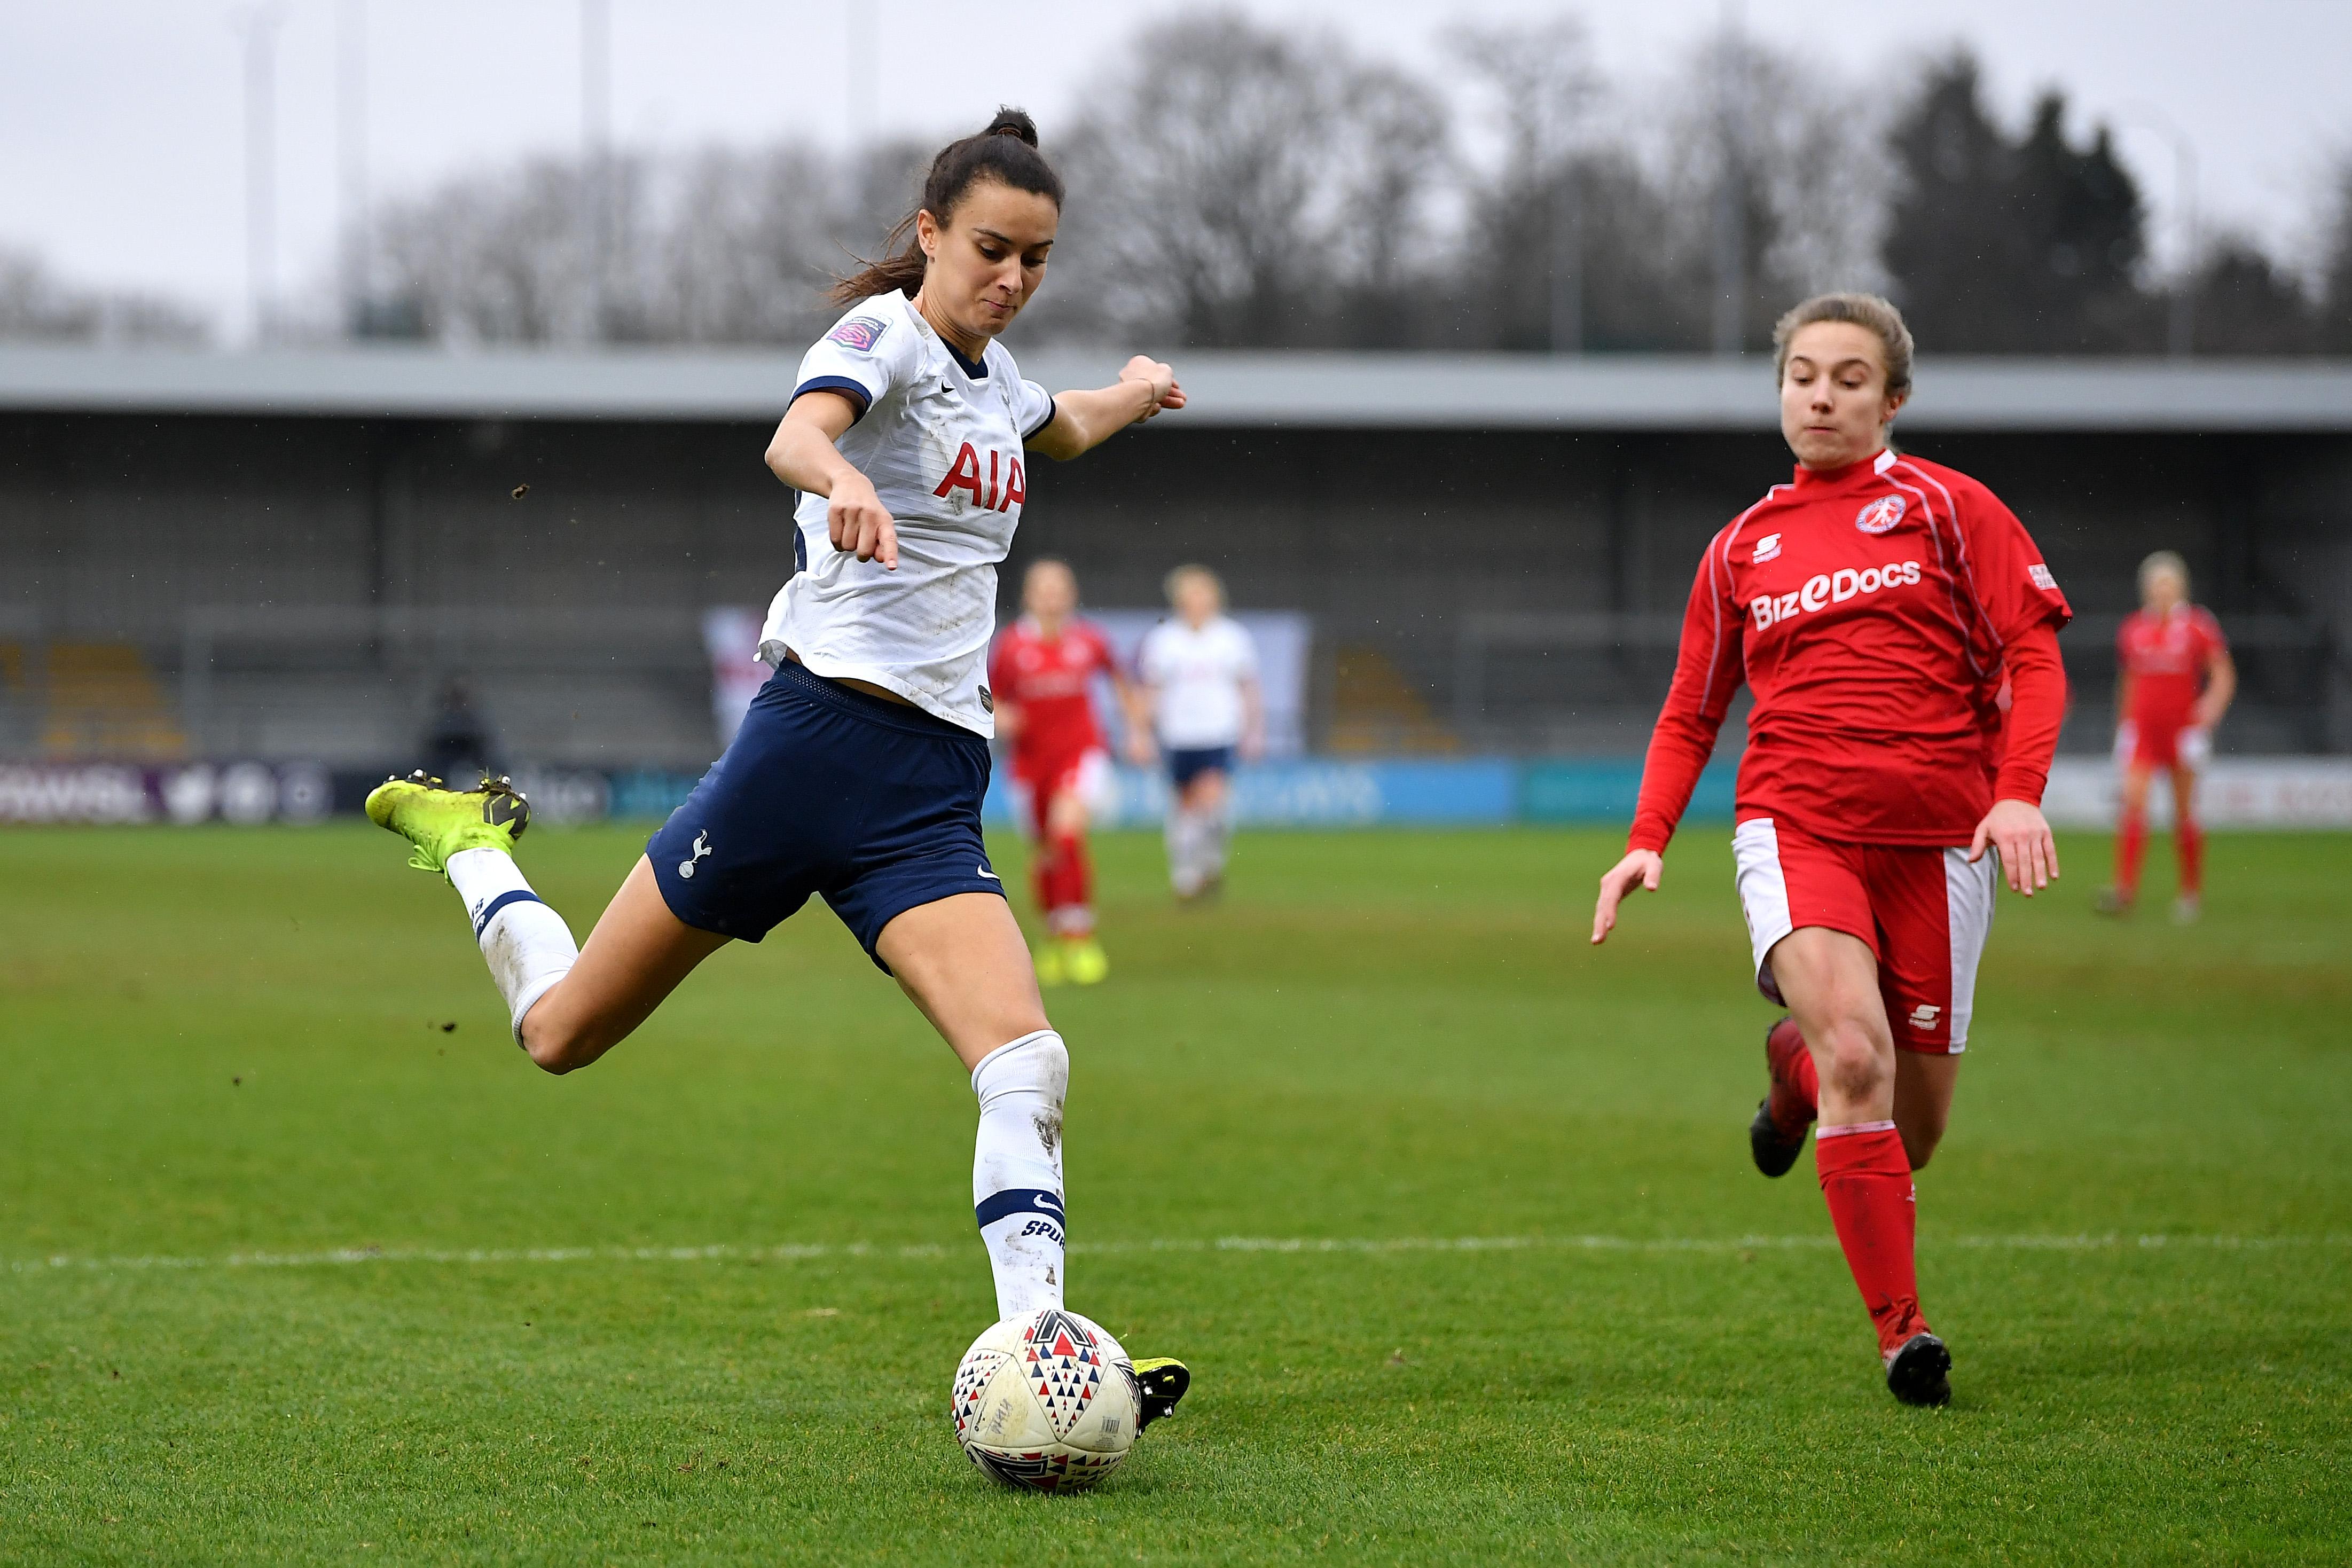 Tottenham Hotspur Women v Barnsley FC Women - Women's FA Cup: Fourth Round